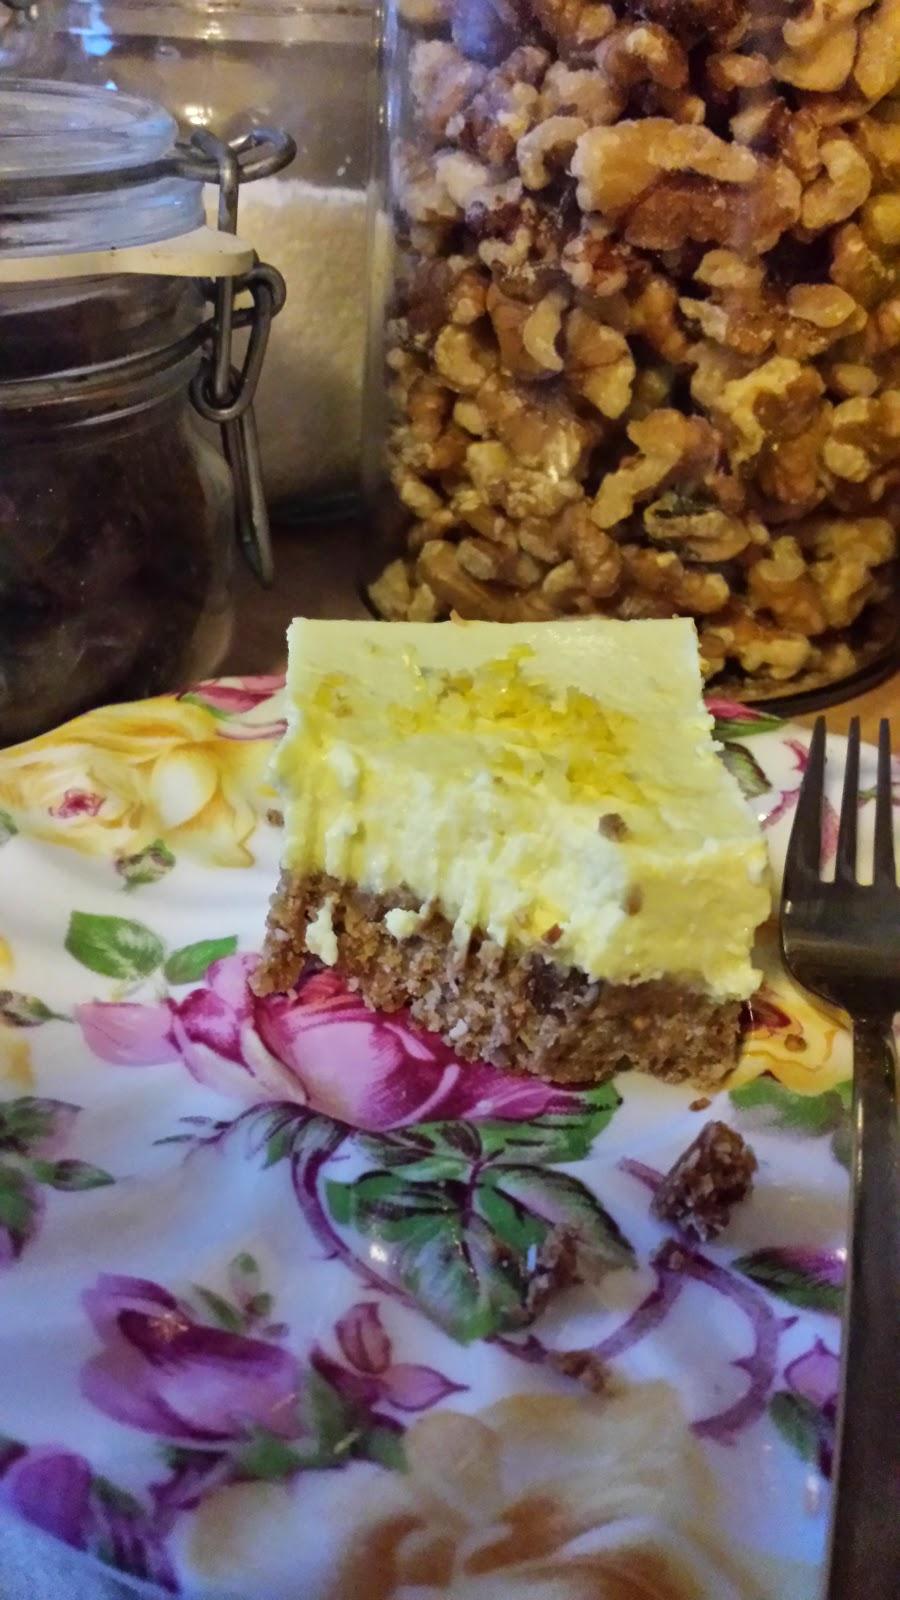 Healthilicious Life - Lemon squares